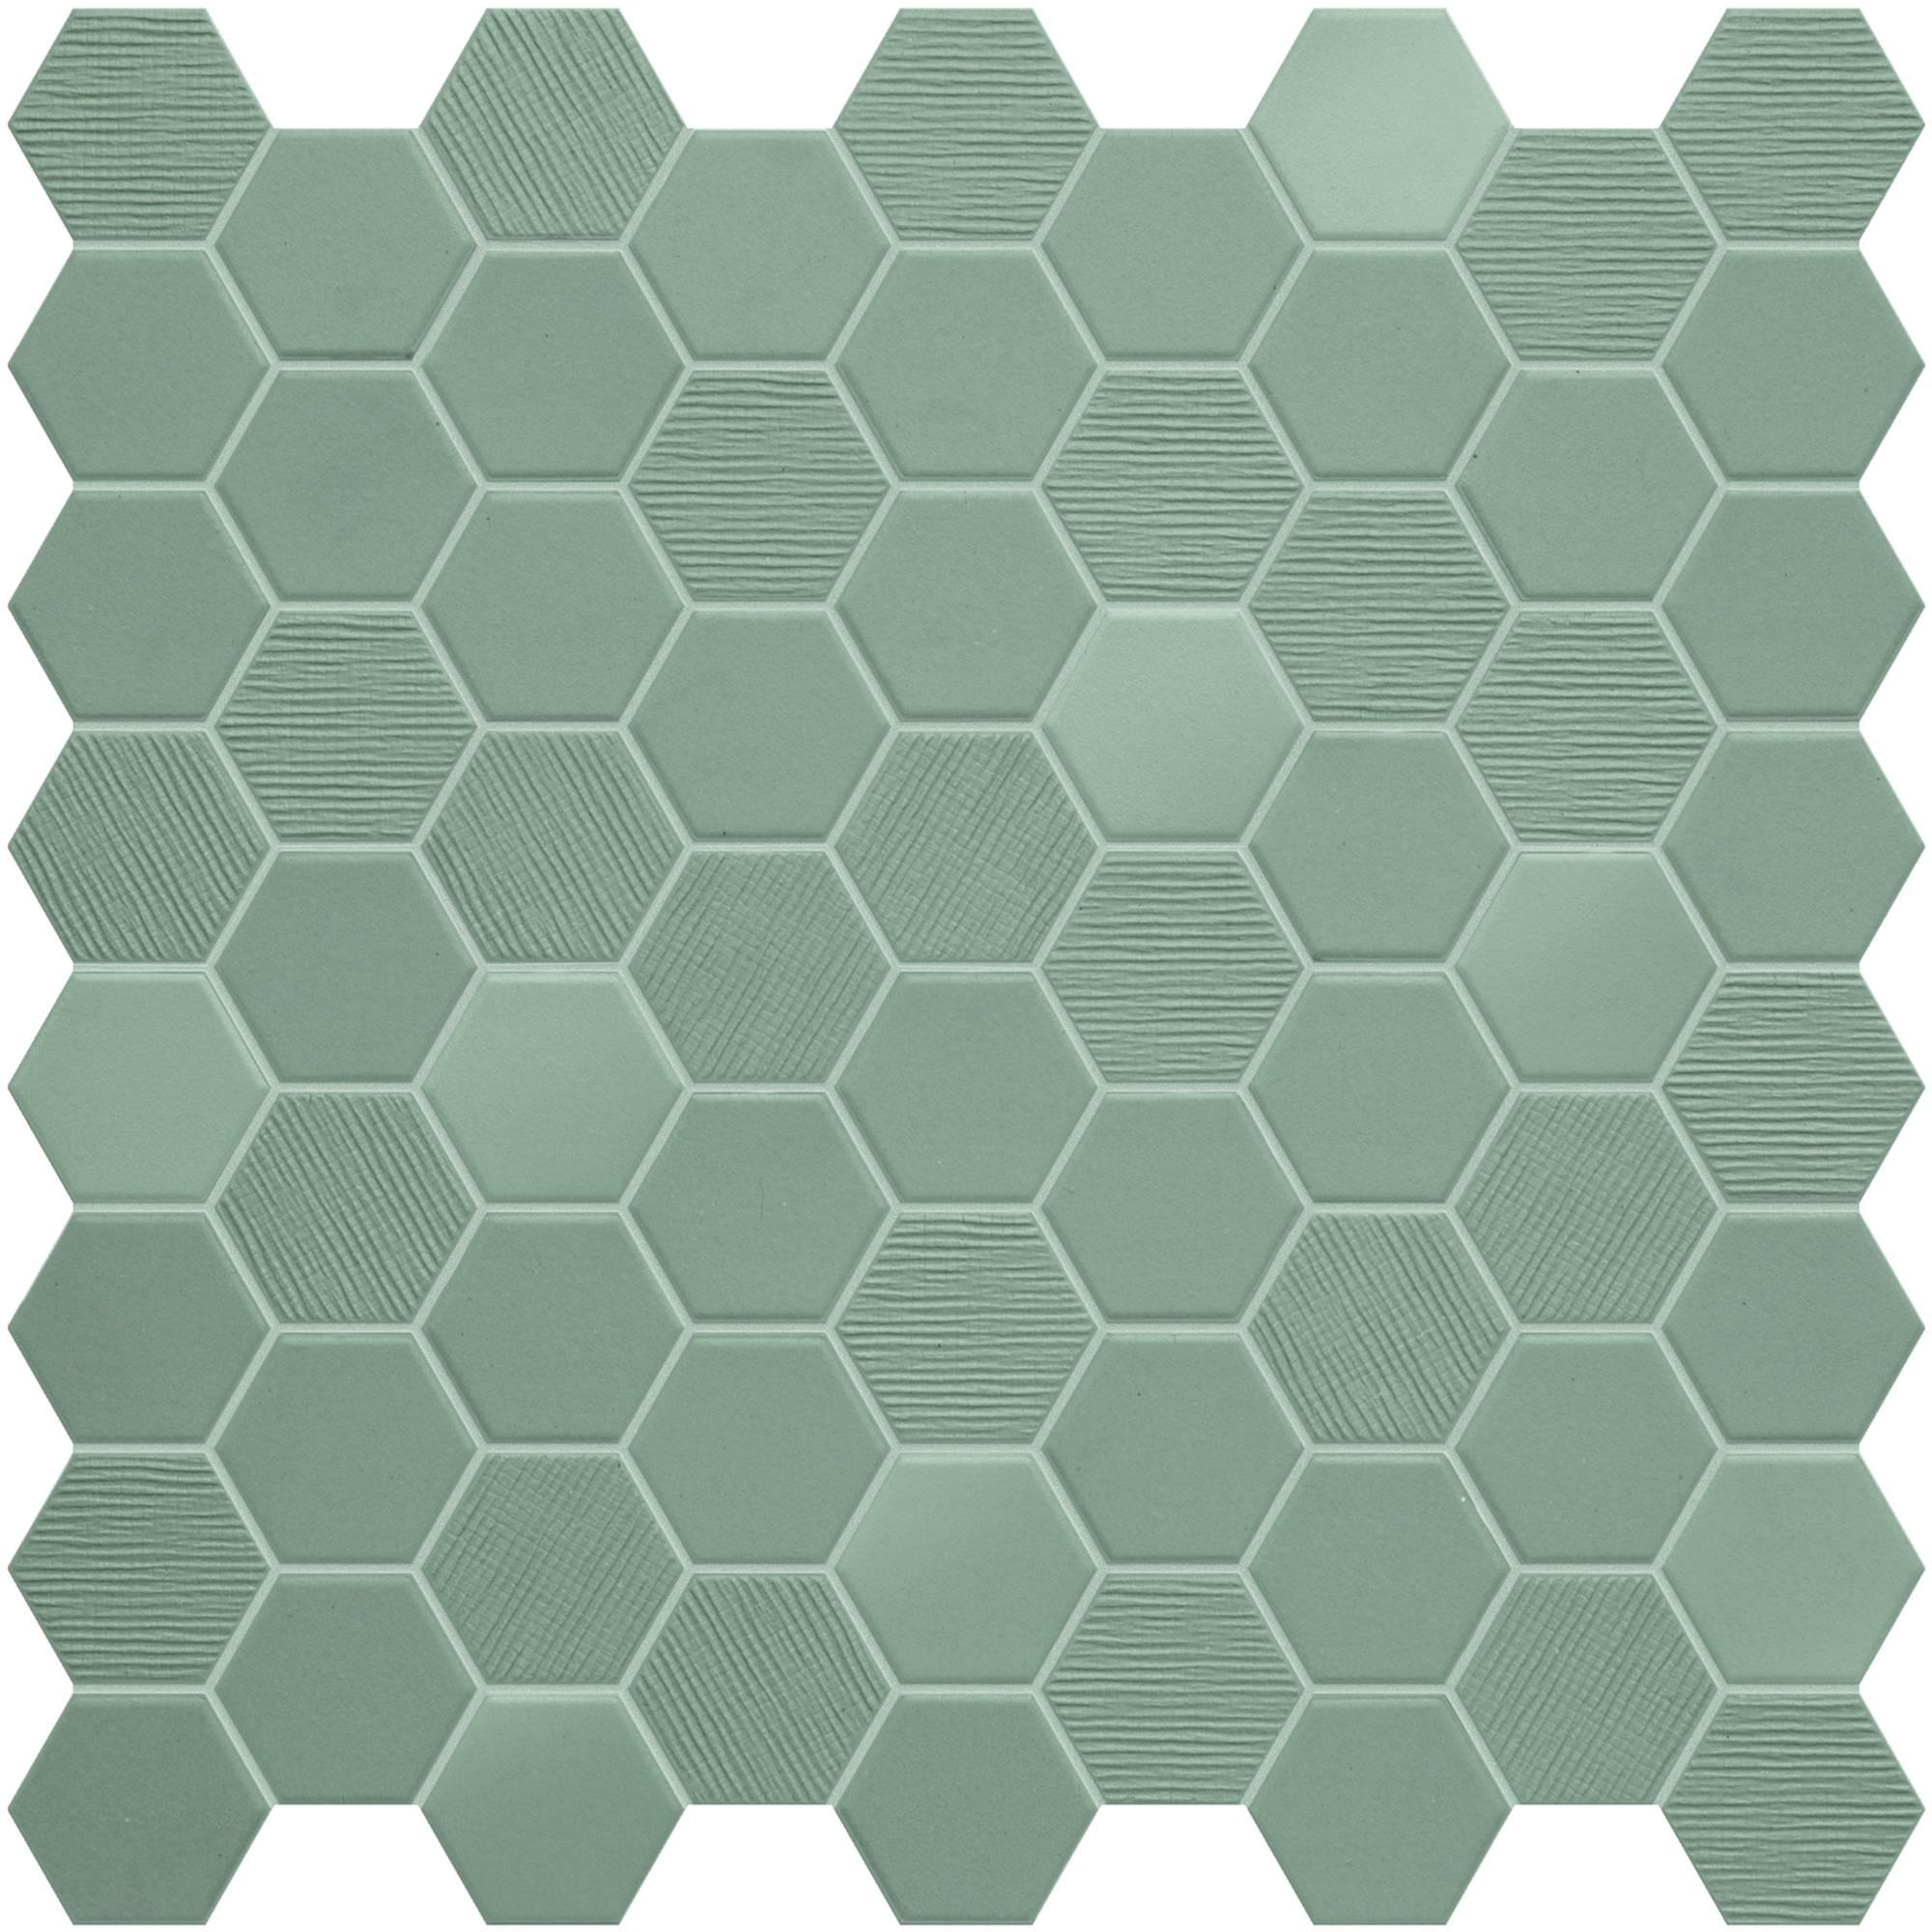 Mozaïek Terratinta Betonstil 31,6x31,6x0,4 cm Hexa Wild Sage 10ST